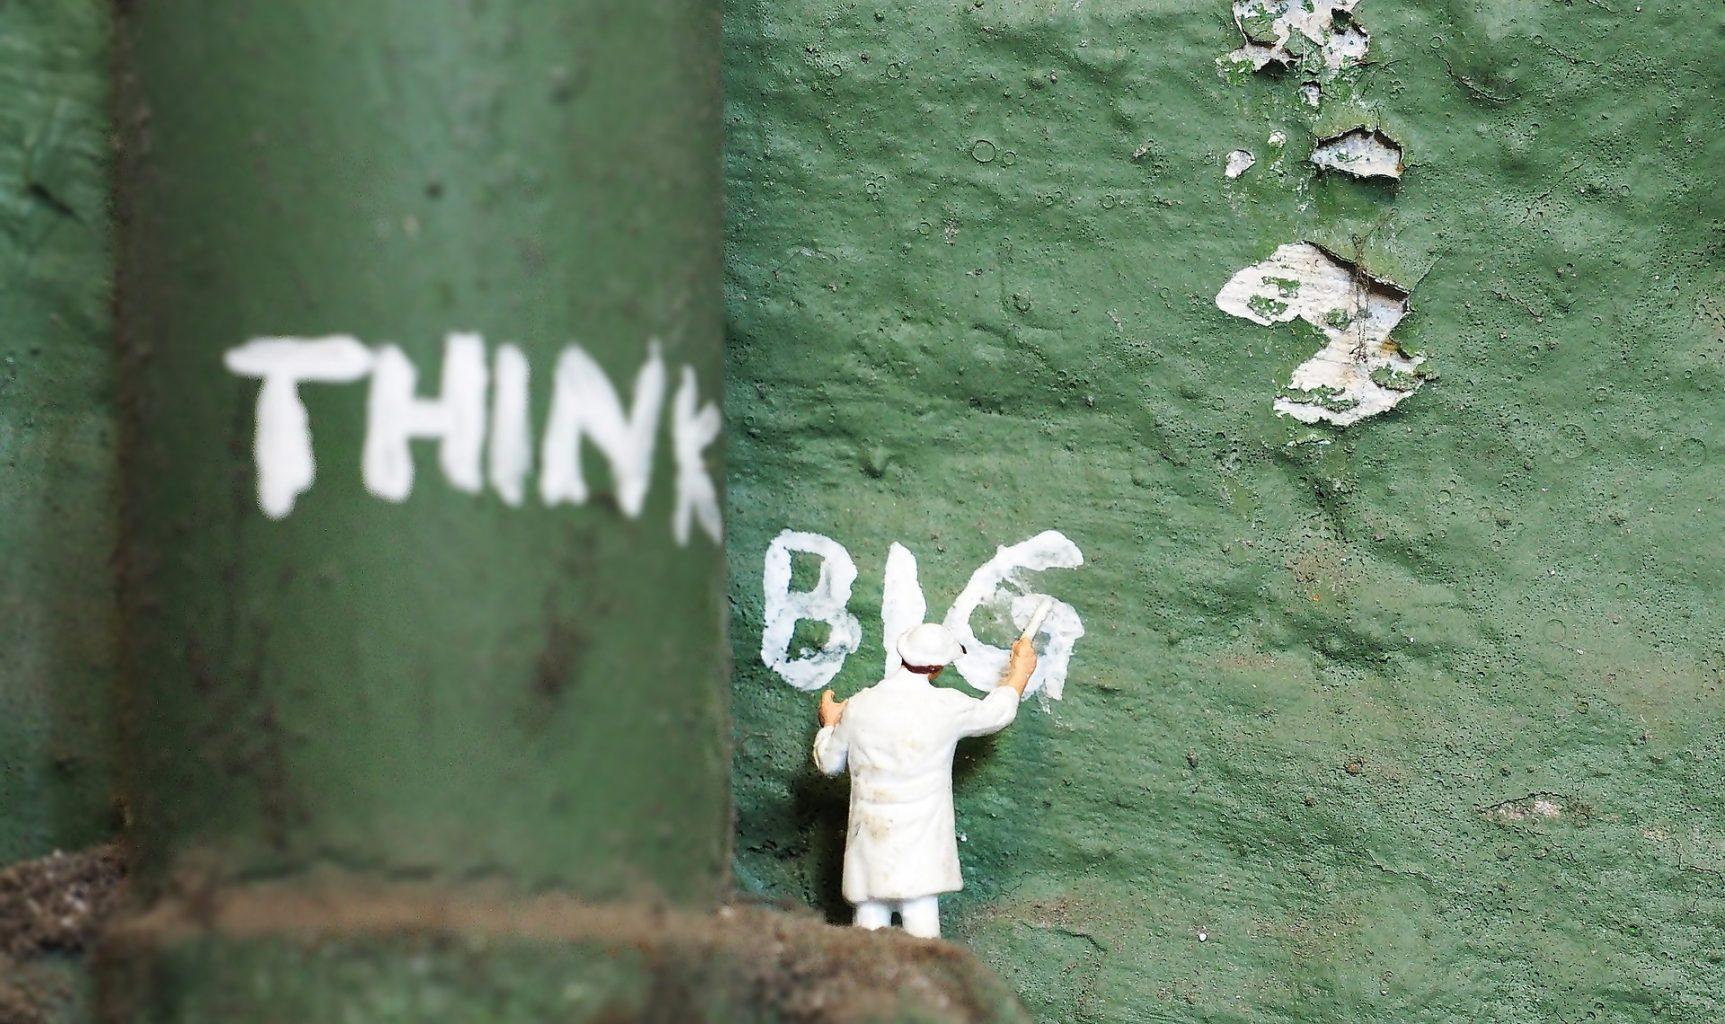 Image: Tiny figure writing think big on green wall